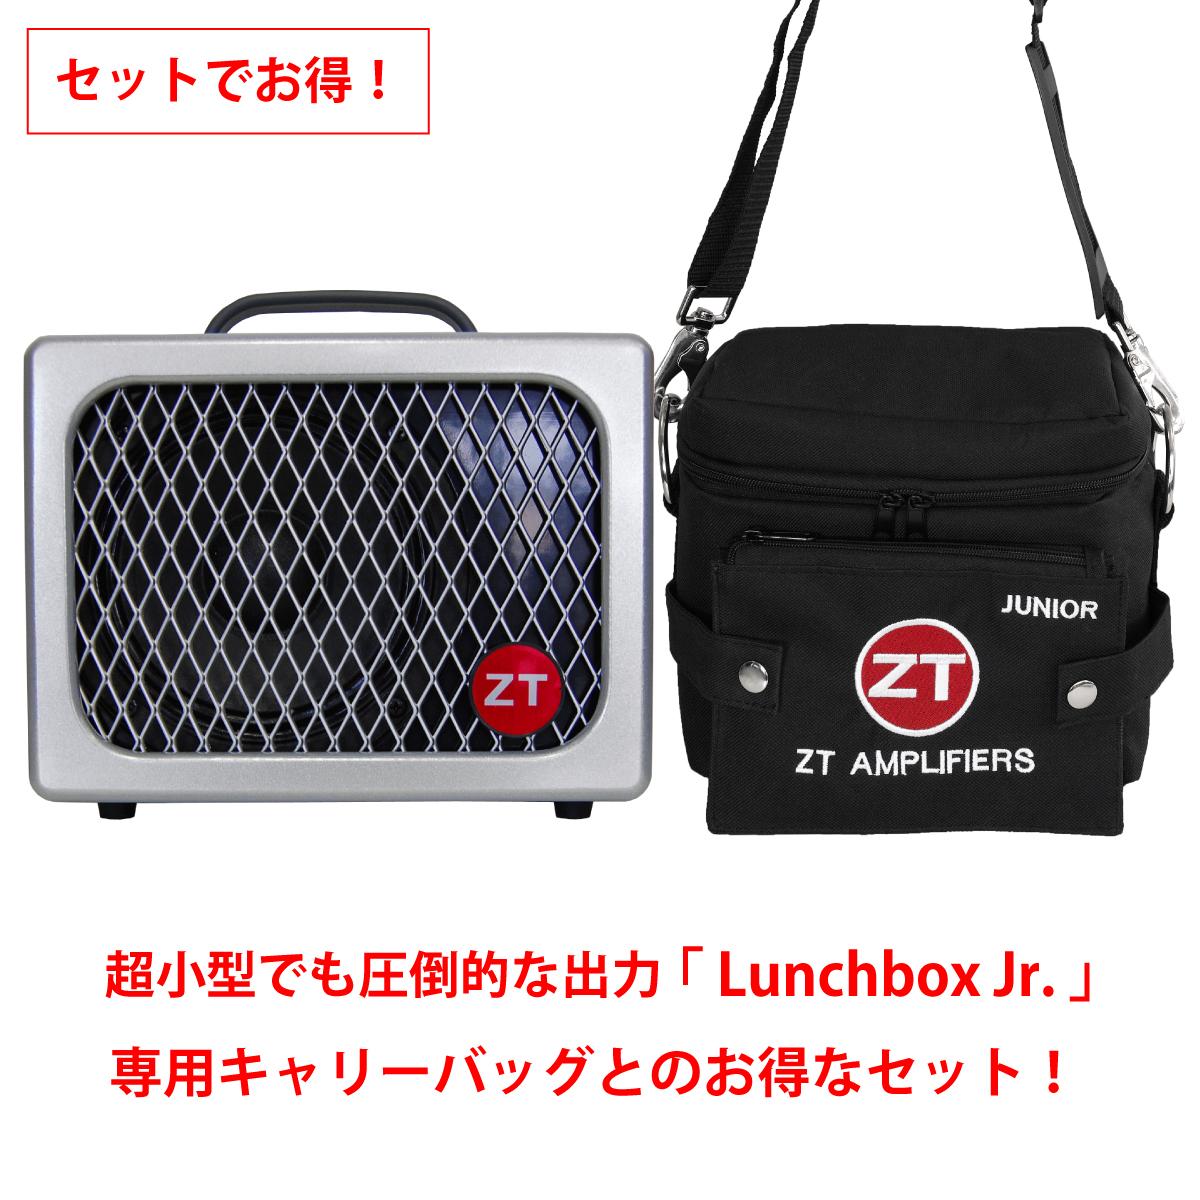 ZT Amp Lunchbox Jr. + Carry Bagセット